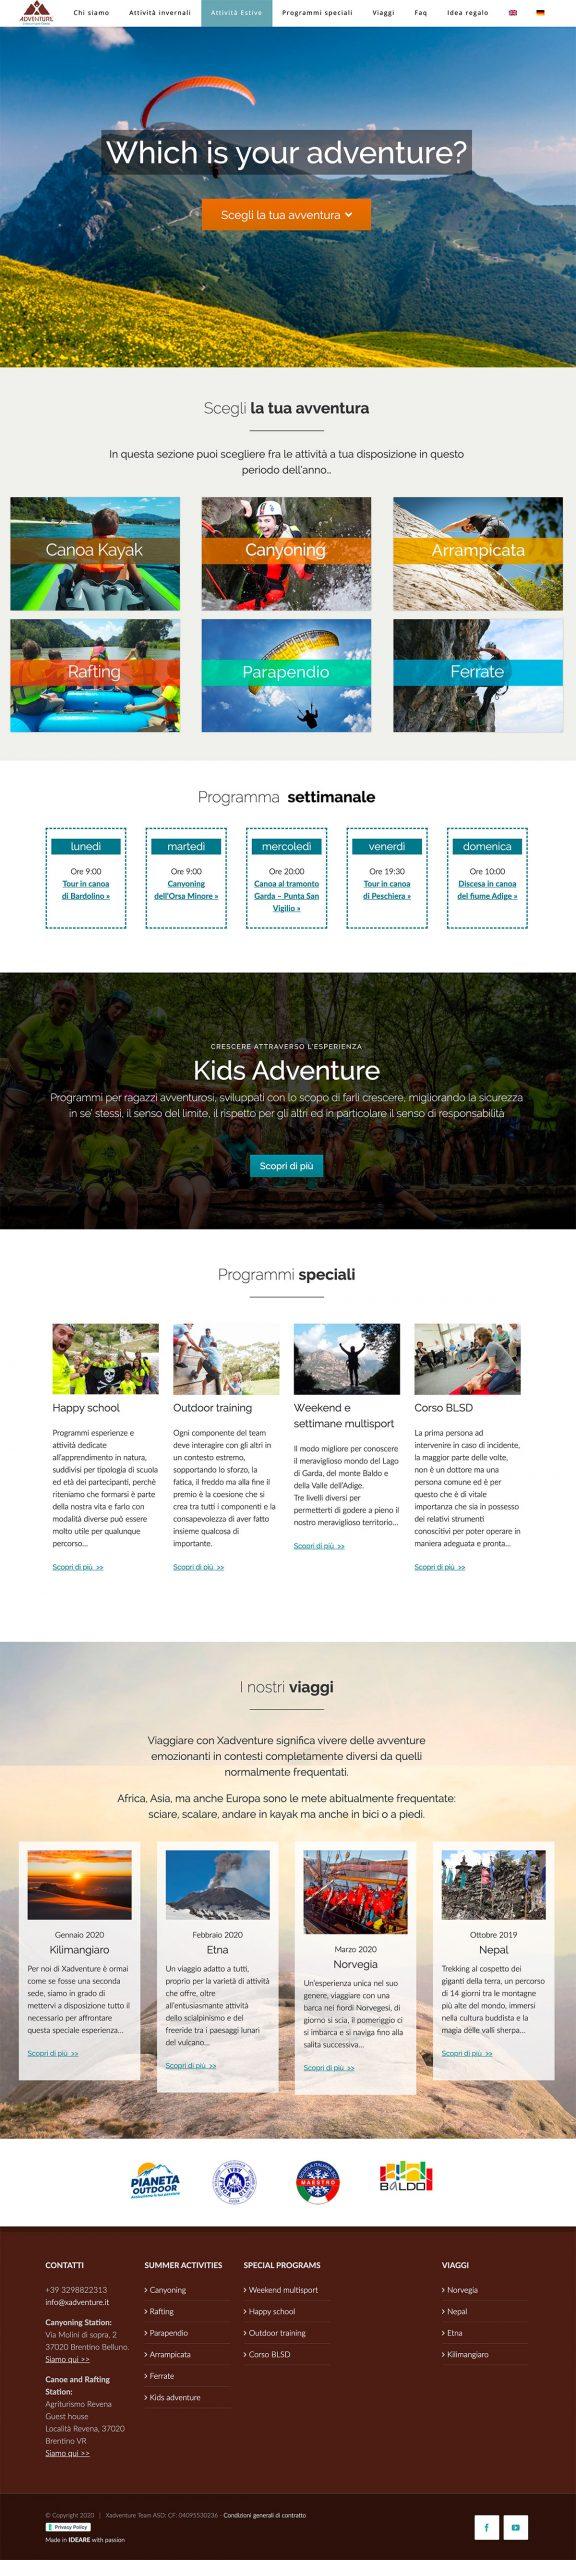 sitiweb-xadventure